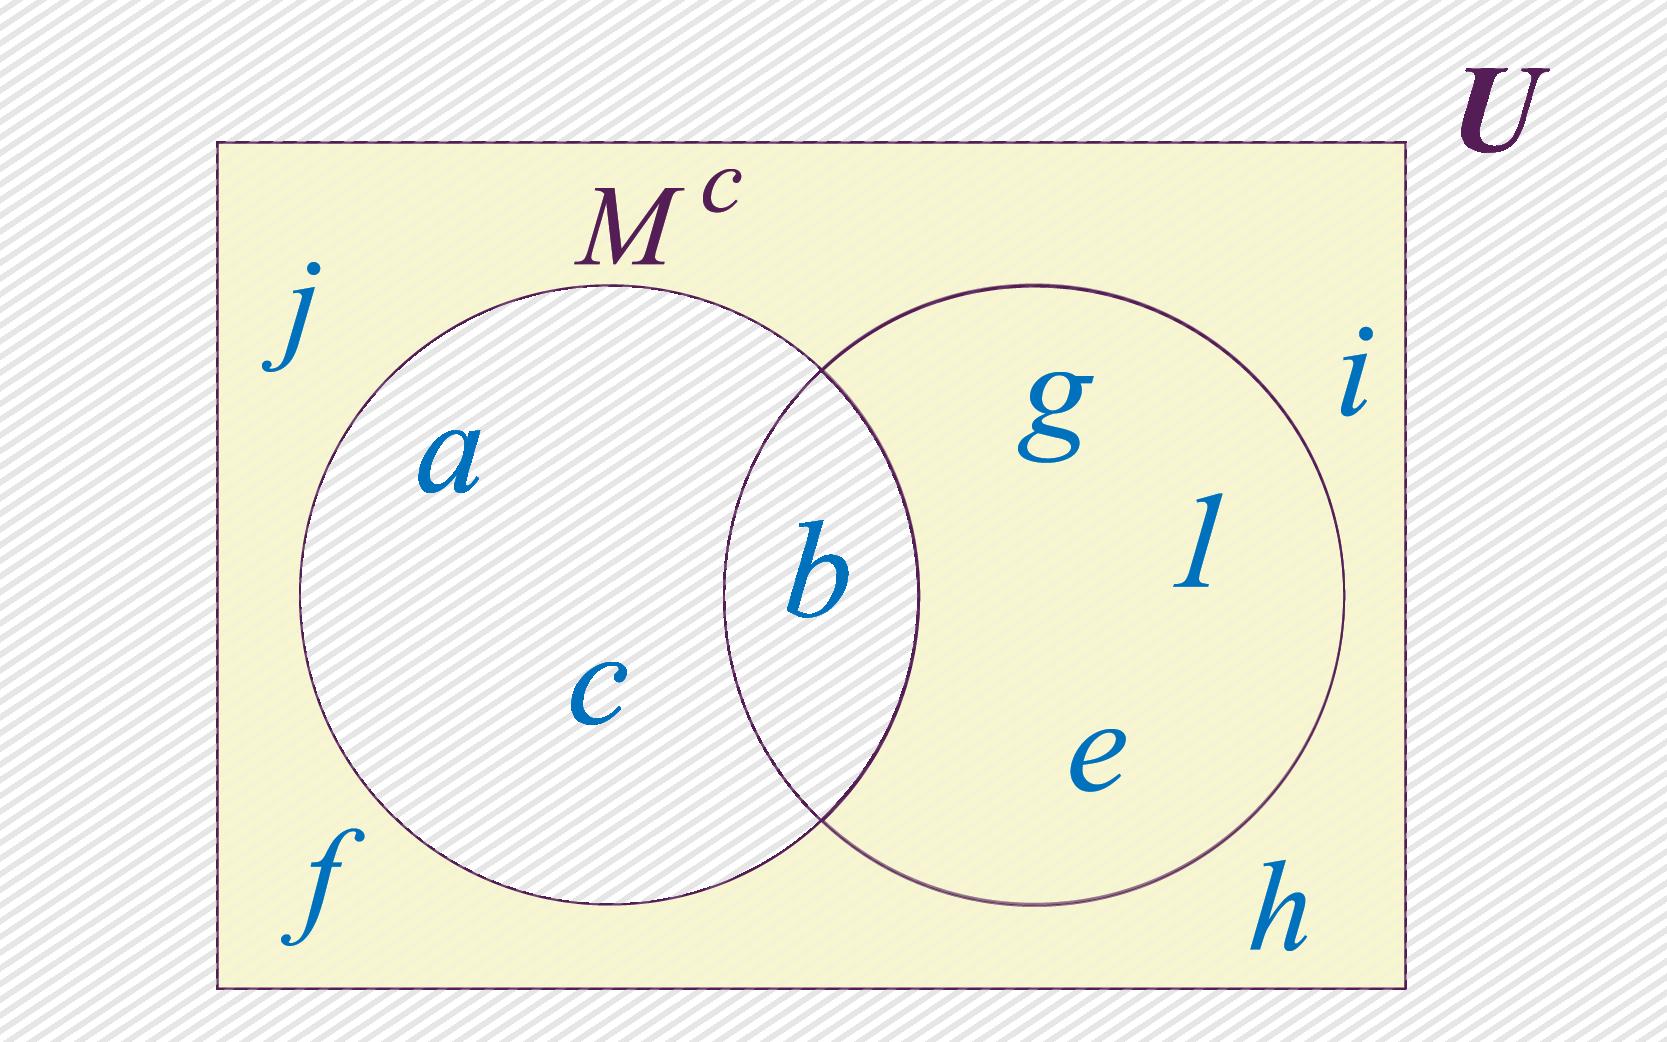 Complemento del conjunto M.